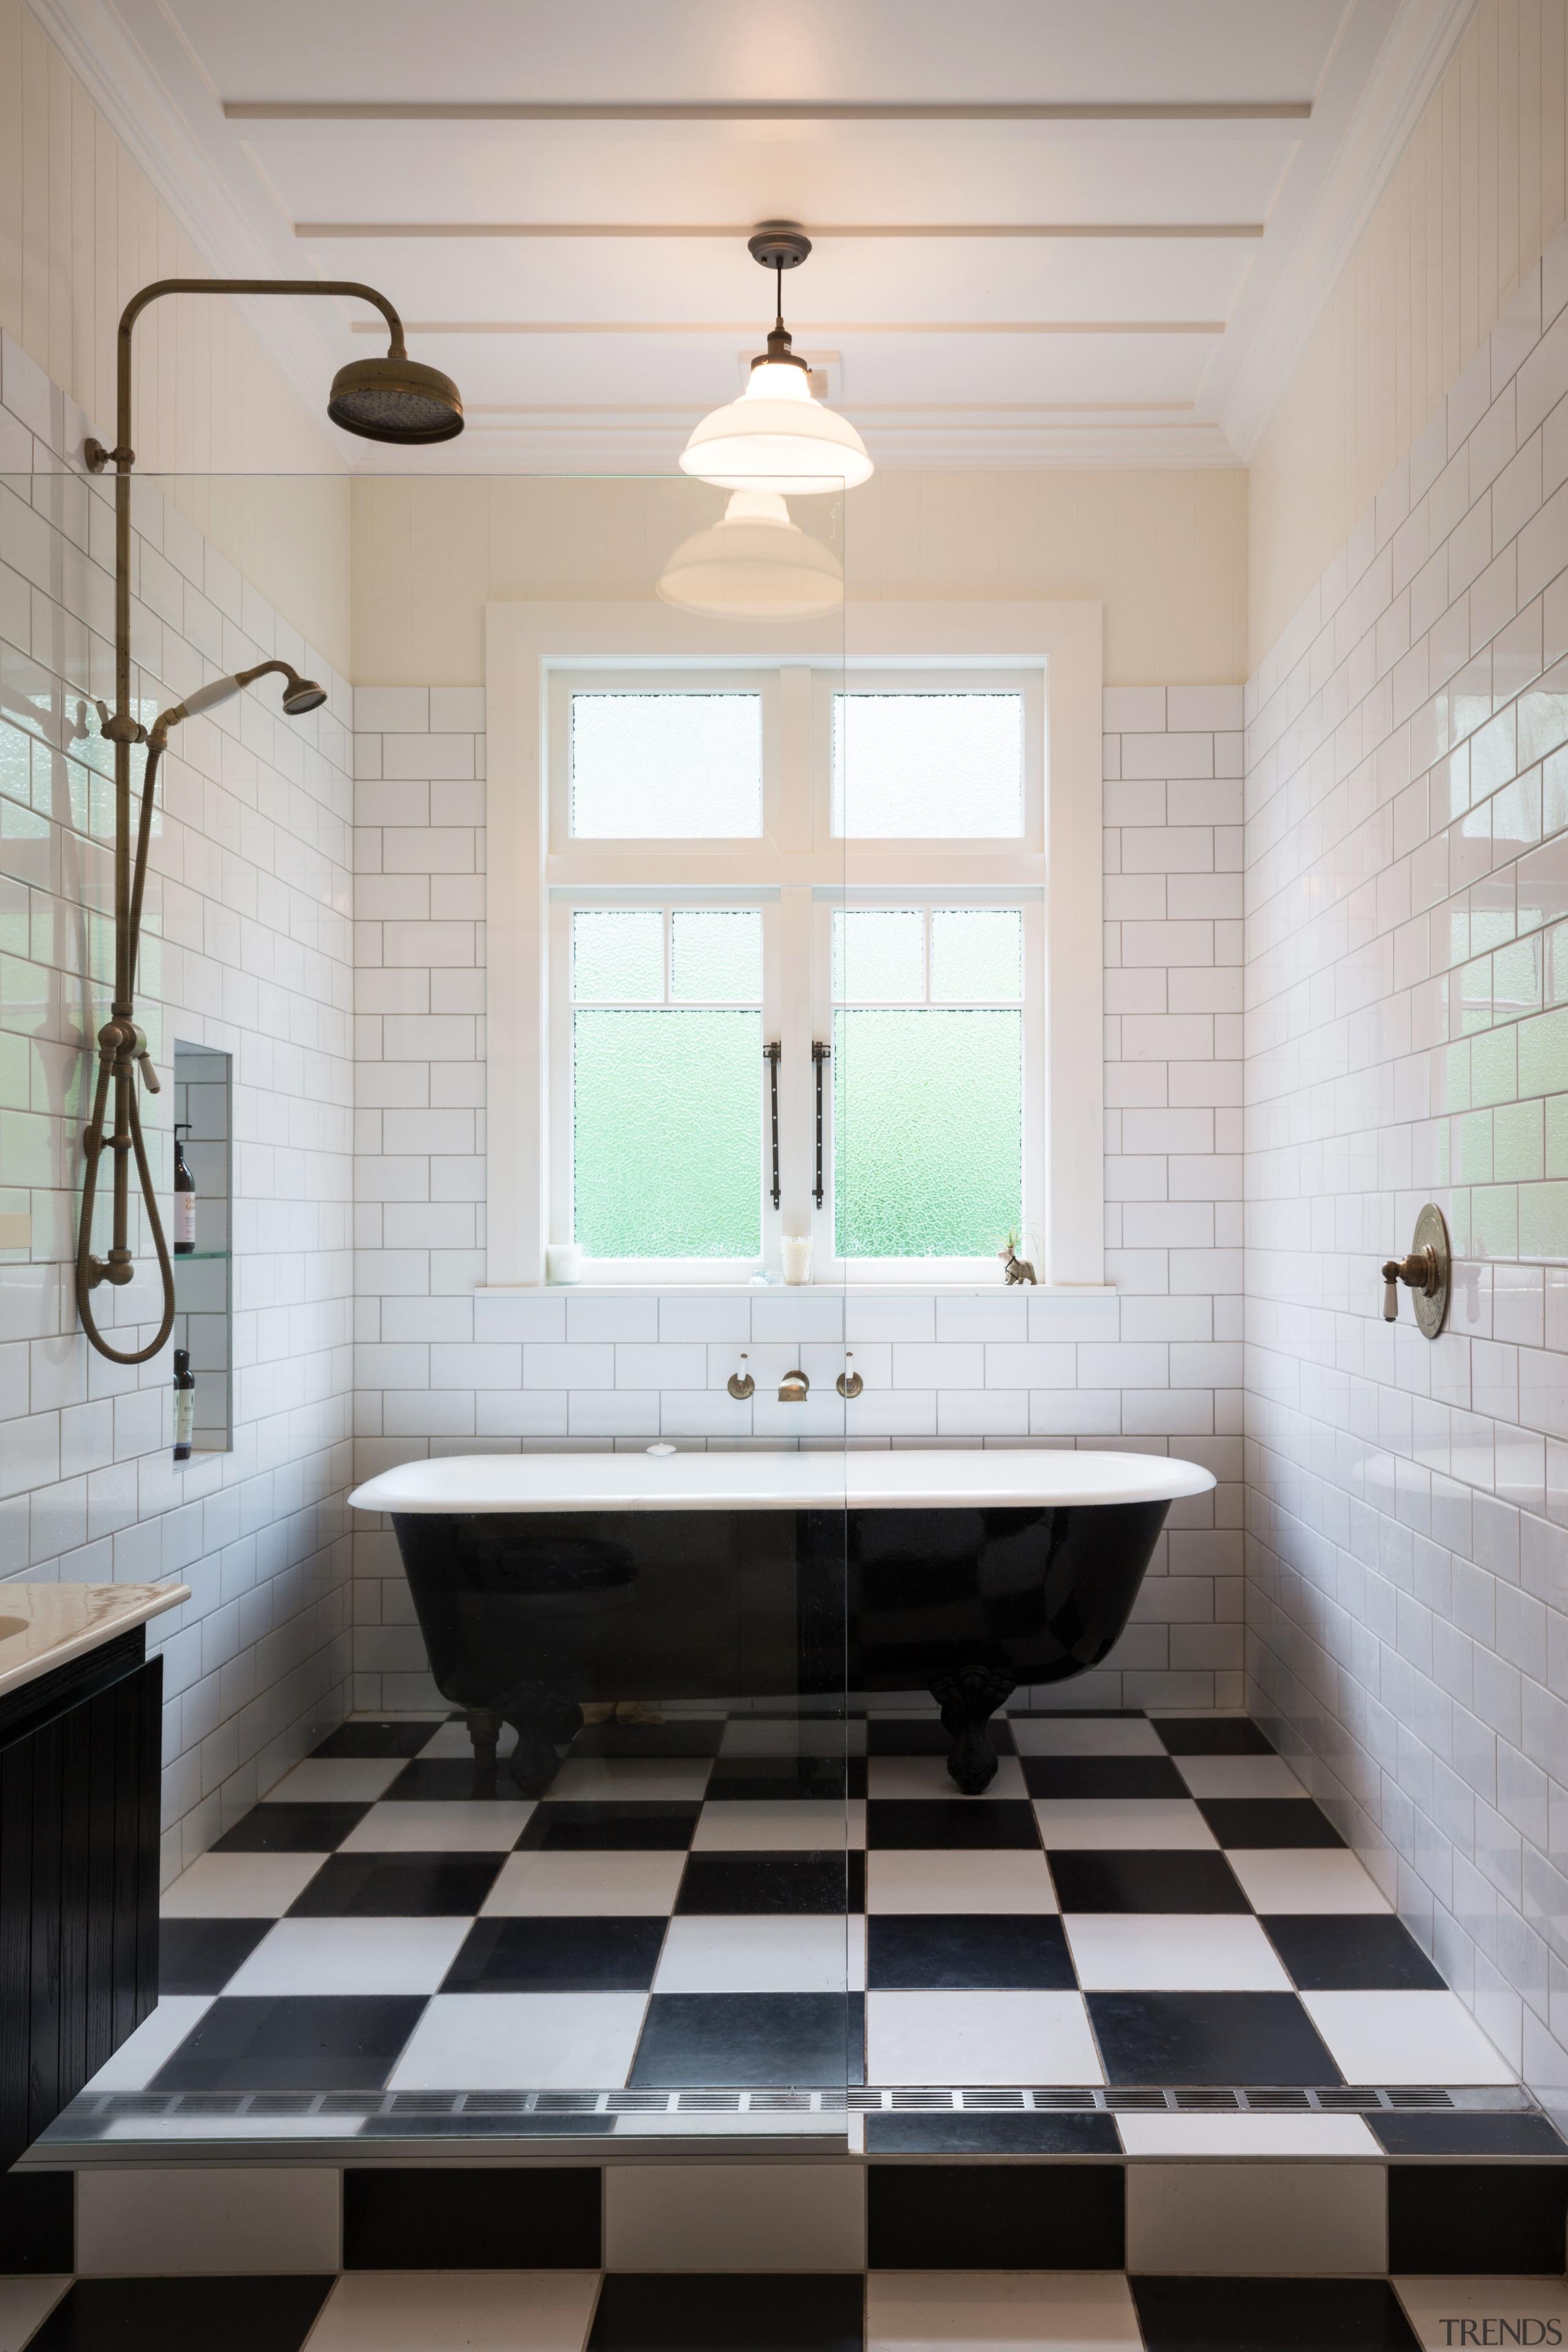 Family Bathroom 3 - architecture | bathroom | architecture, bathroom, ceiling, daylighting, floor, flooring, home, interior design, room, sink, tile, gray, white